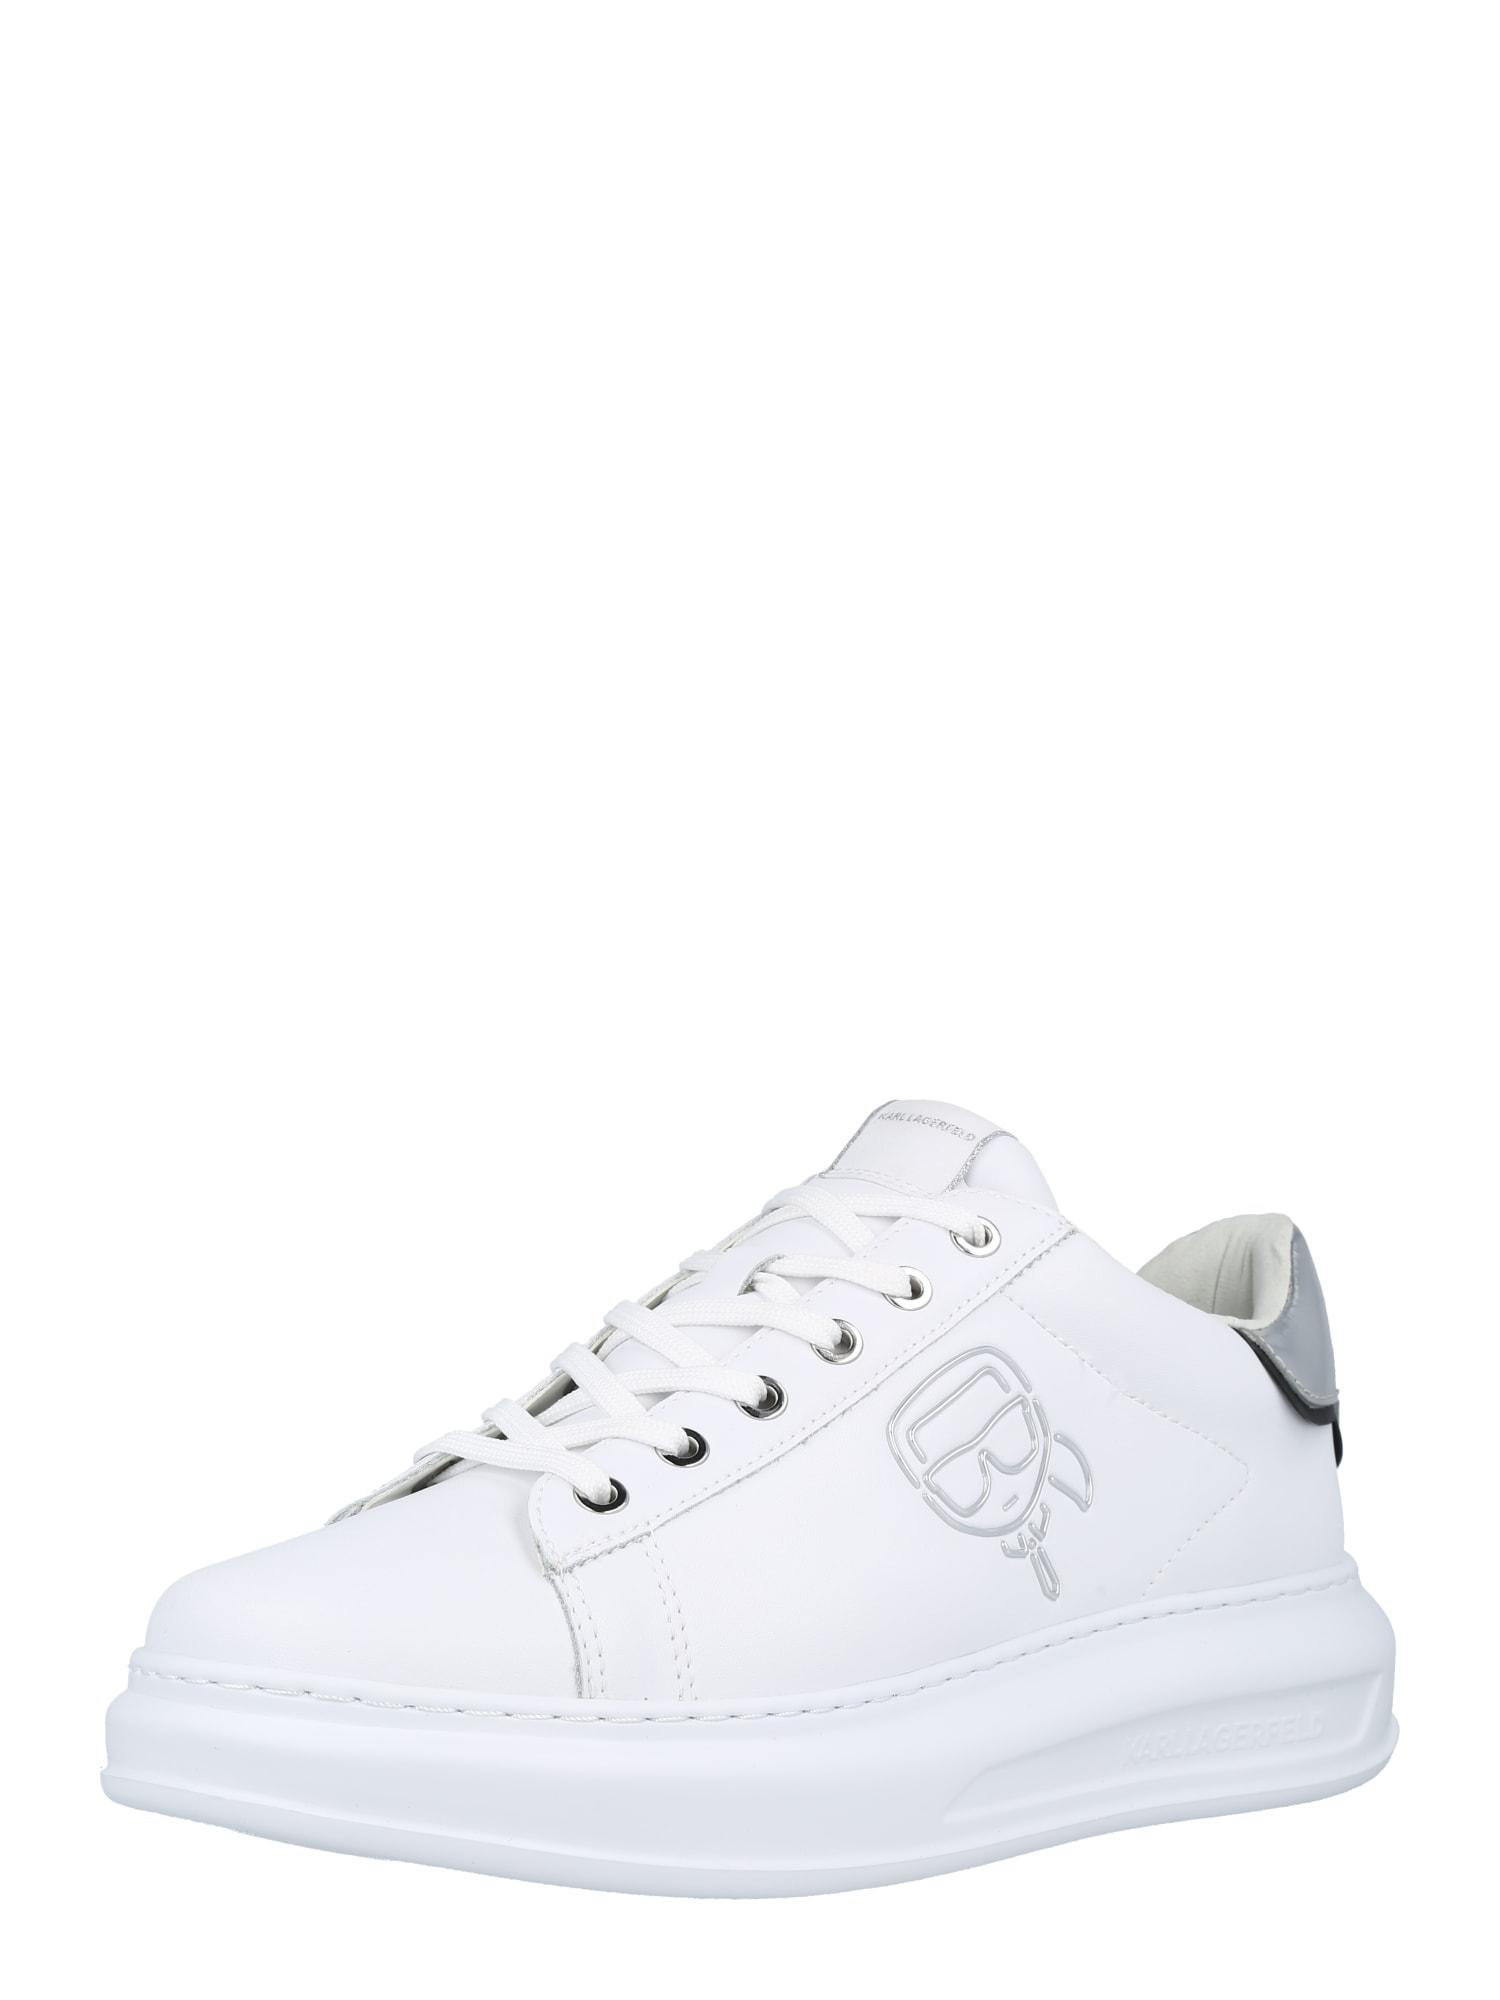 Karl Lagerfeld Tenisky  bílá / stříbrná